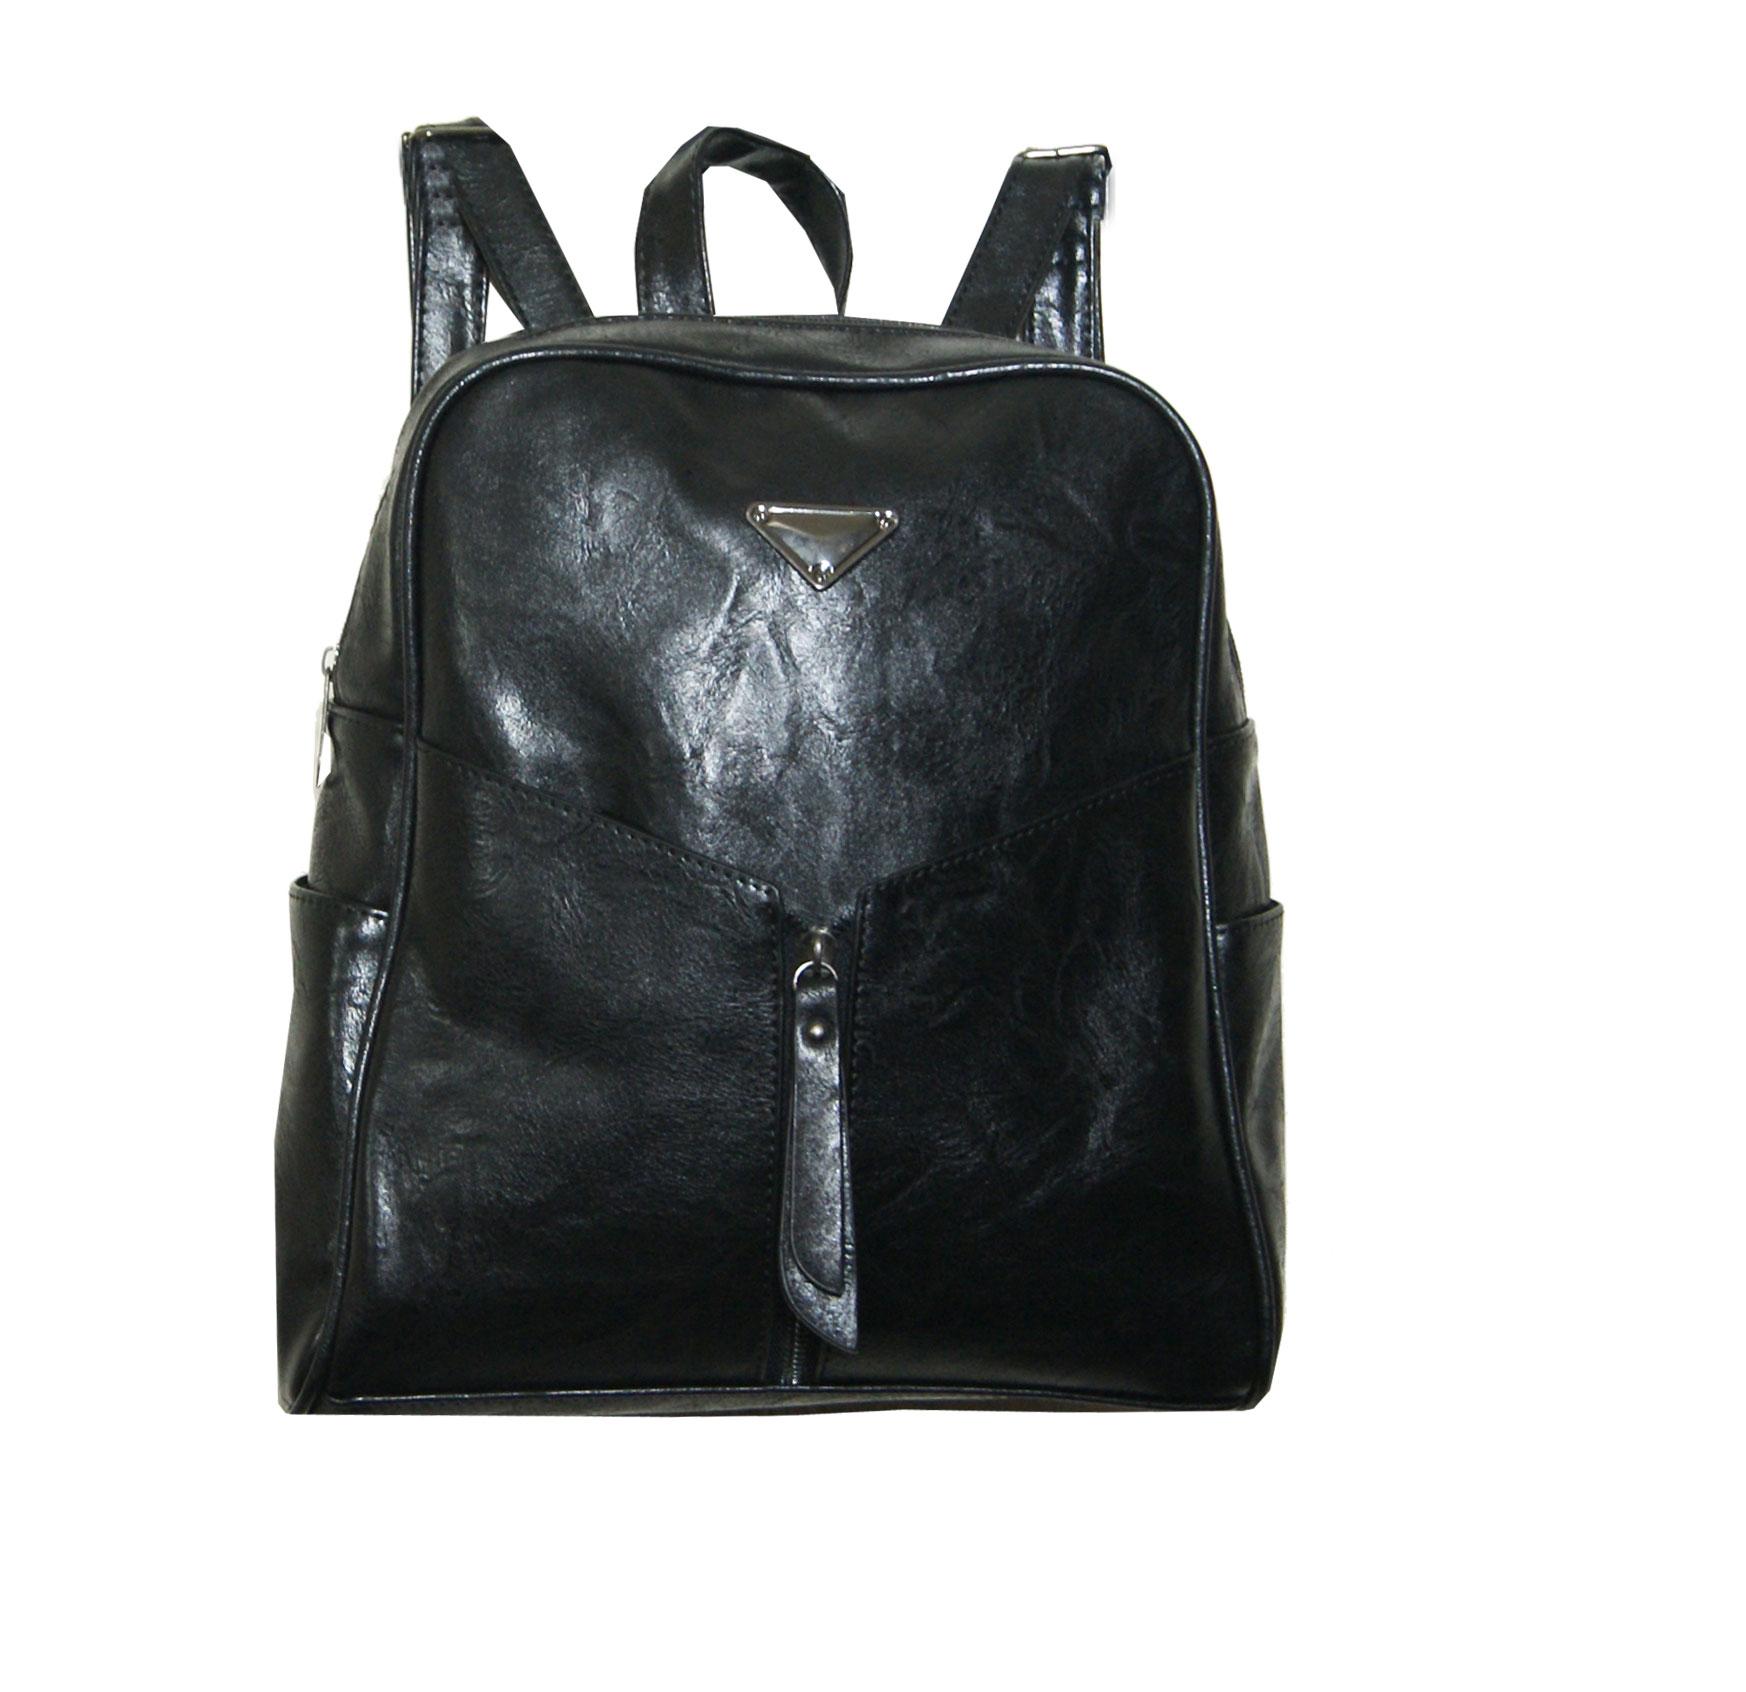 Backpack No 754 - Μαύρο (Silvio 754)